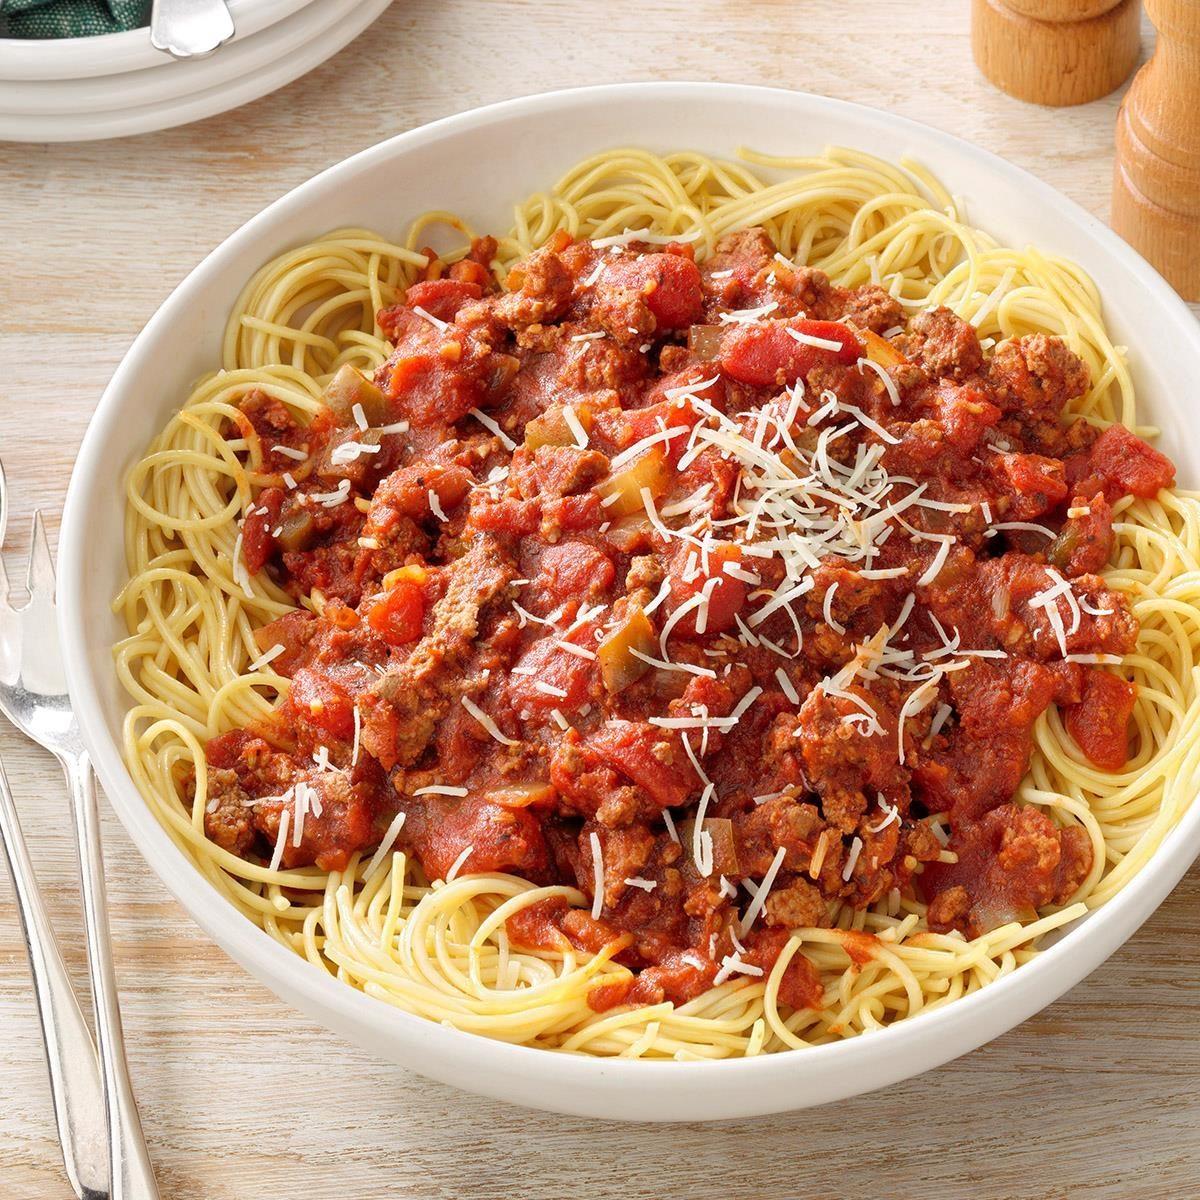 Meaty Spaghetti Sauce Exps Scsbz21 13849 B01 14 1b 3